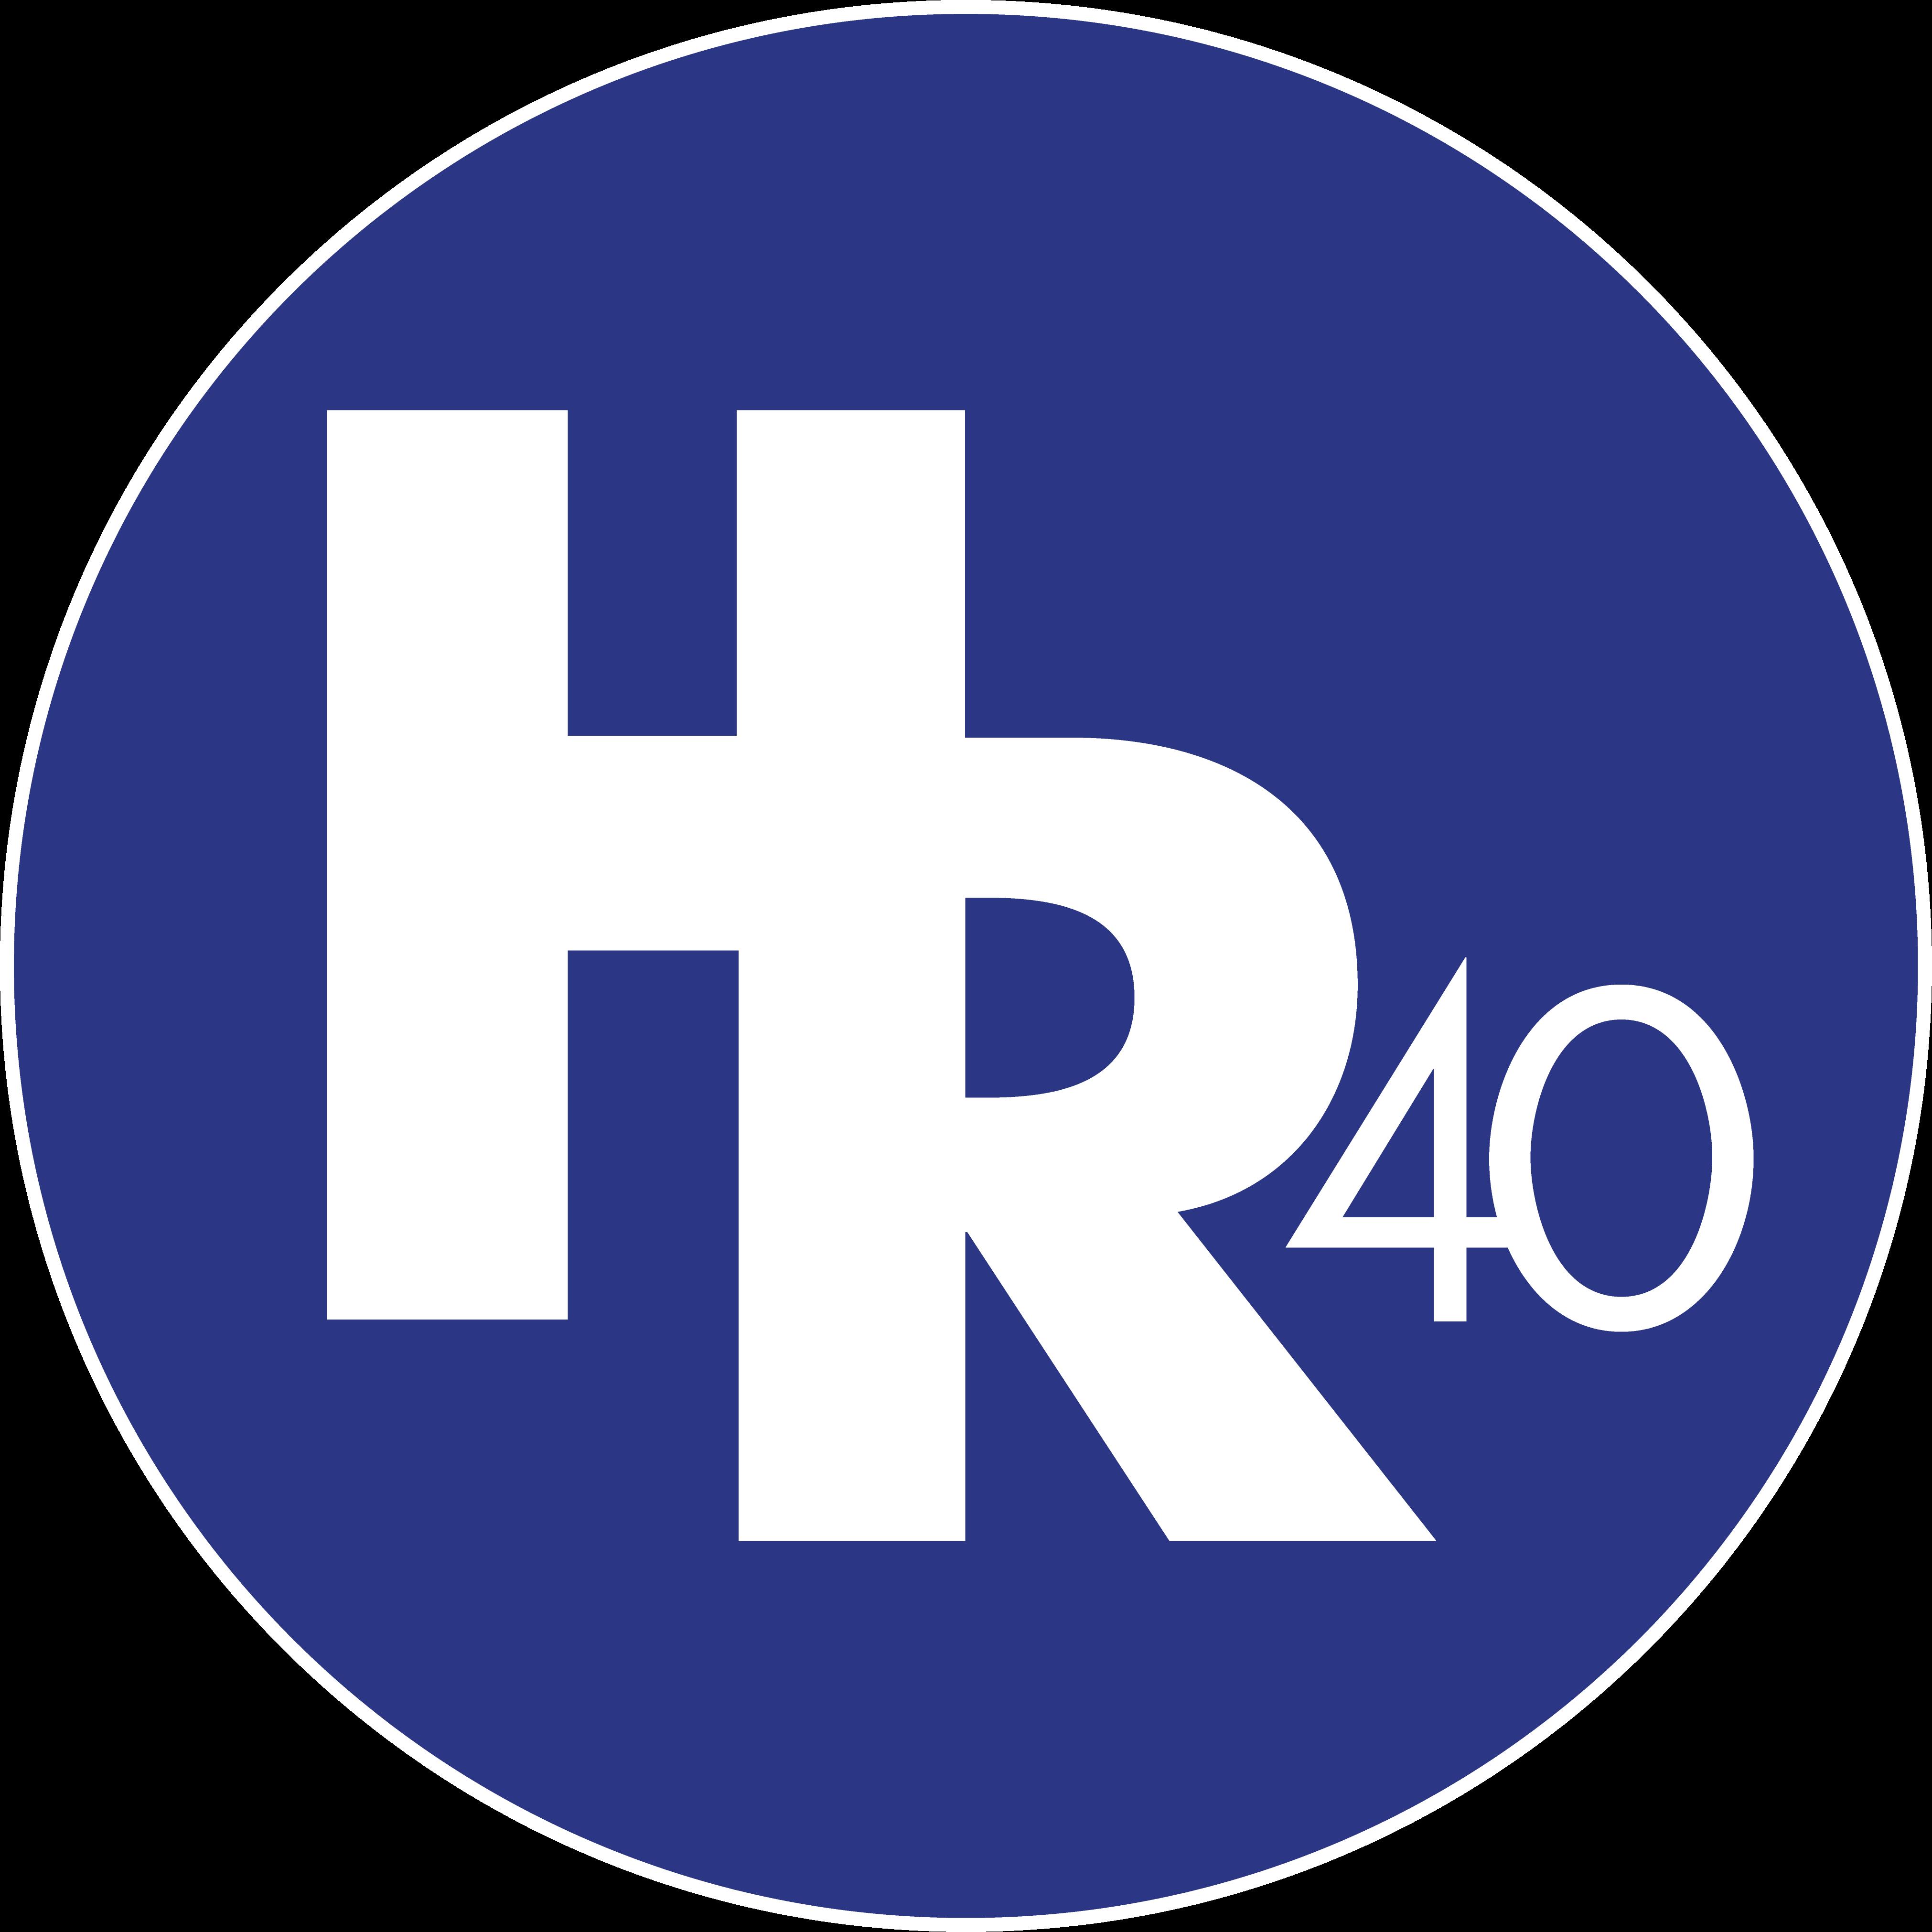 HR40 Logo Blue